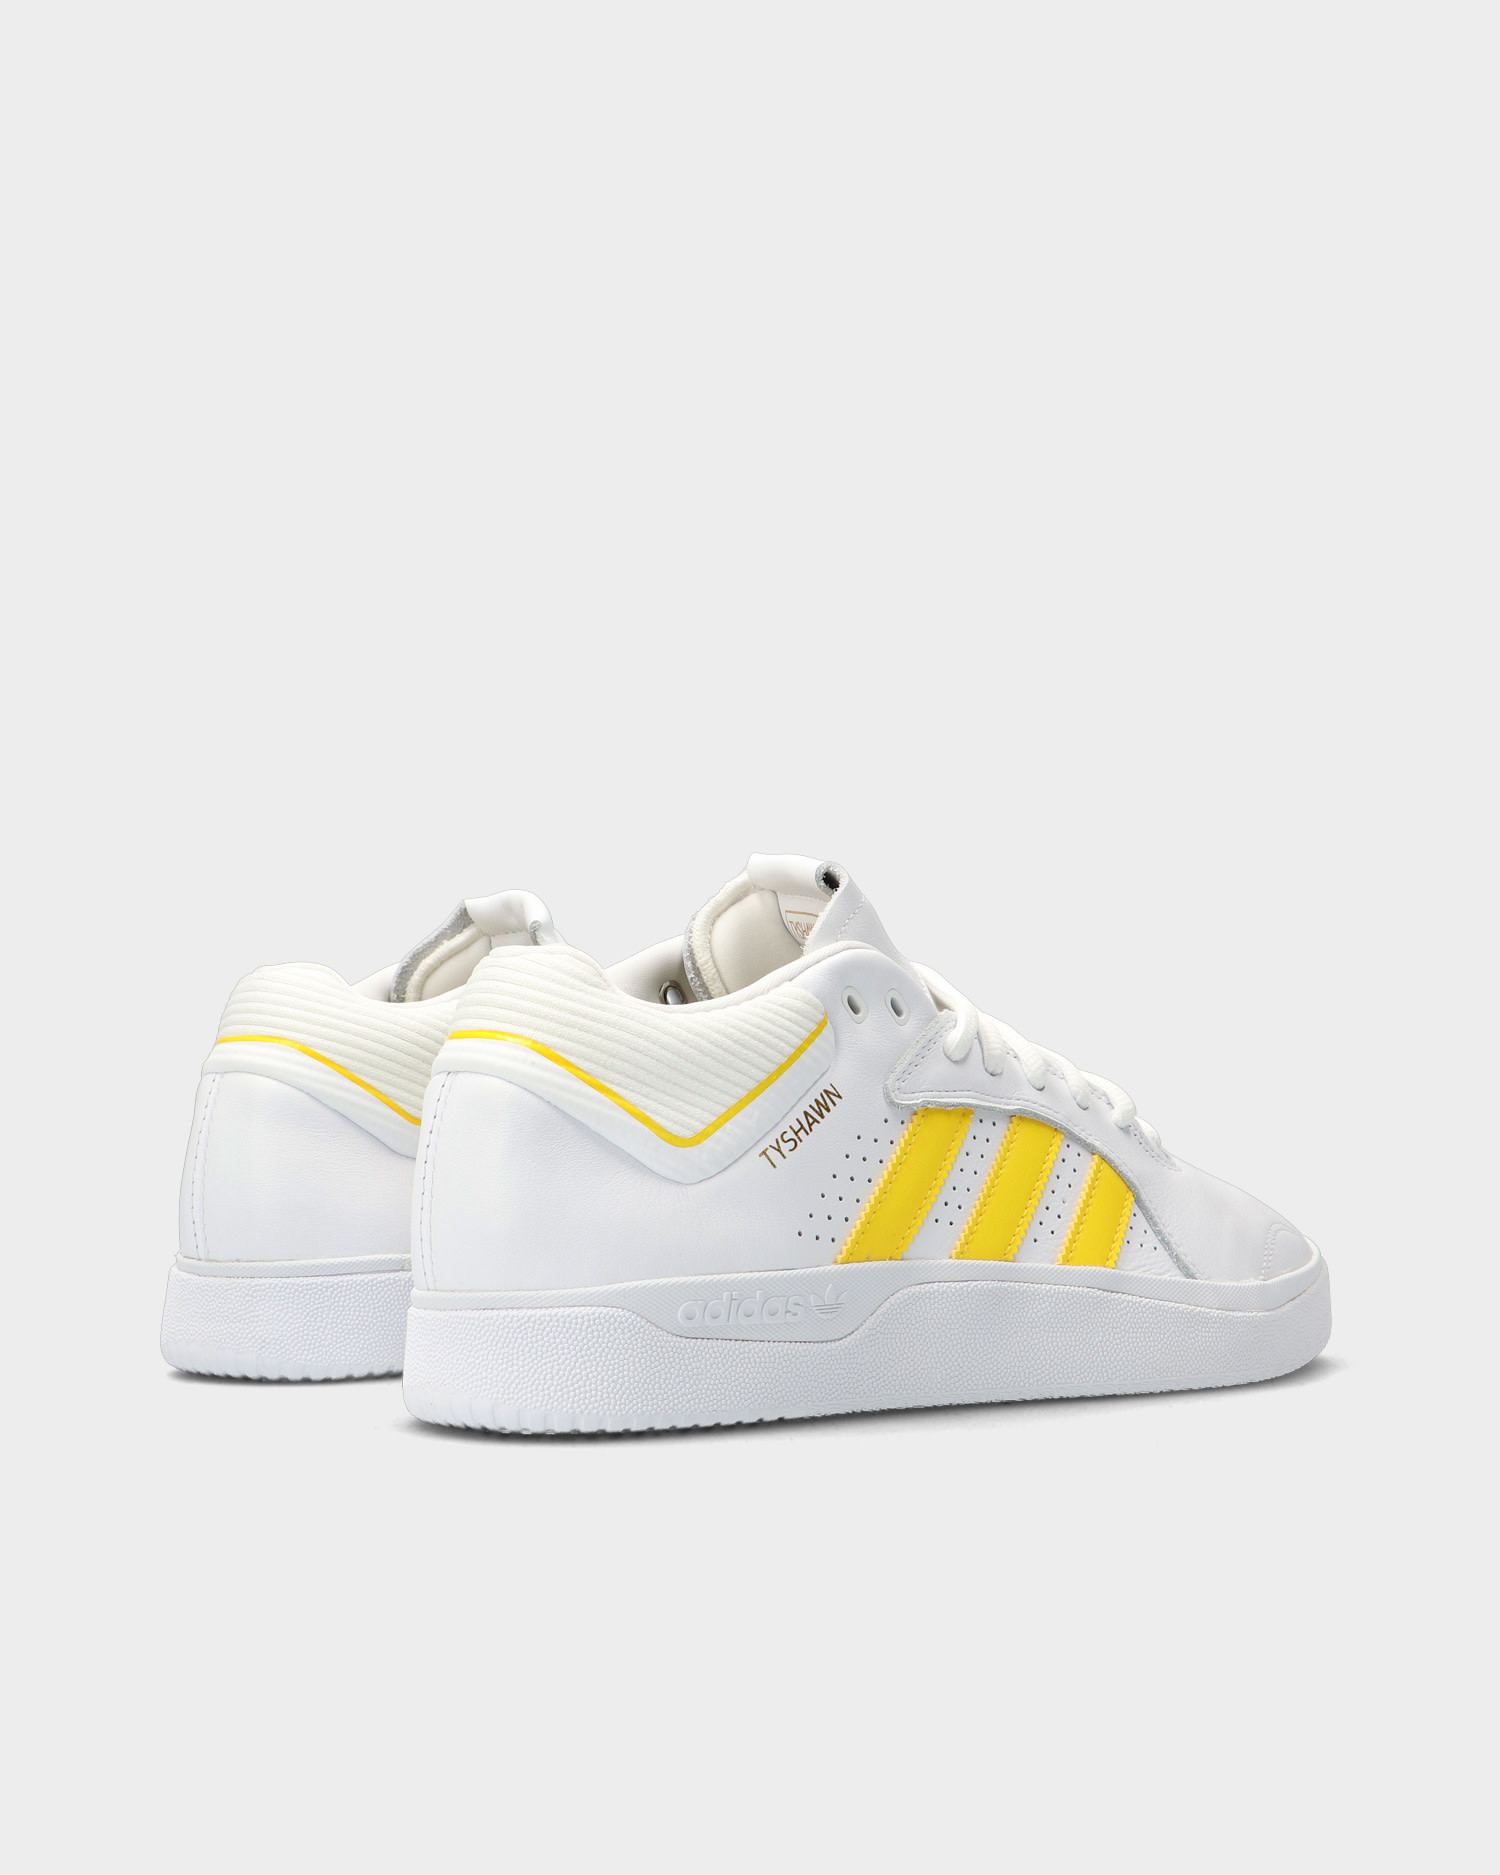 Adidas Tyshawn Footwear White /Yellow/Goldmt